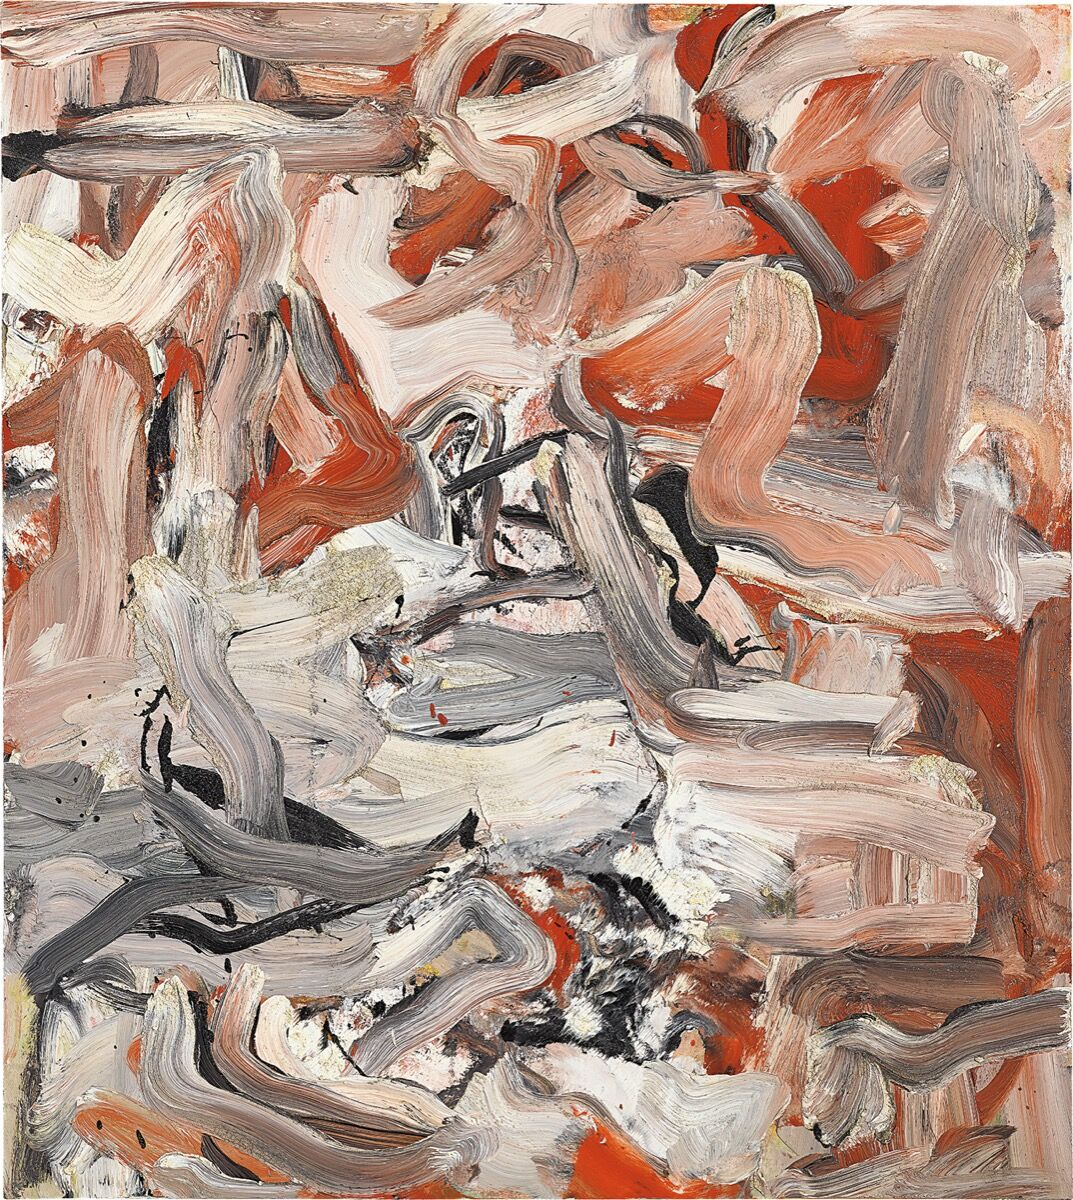 Willem de Kooning, Untitled XVI, 1976. Courtesy of Phillips.